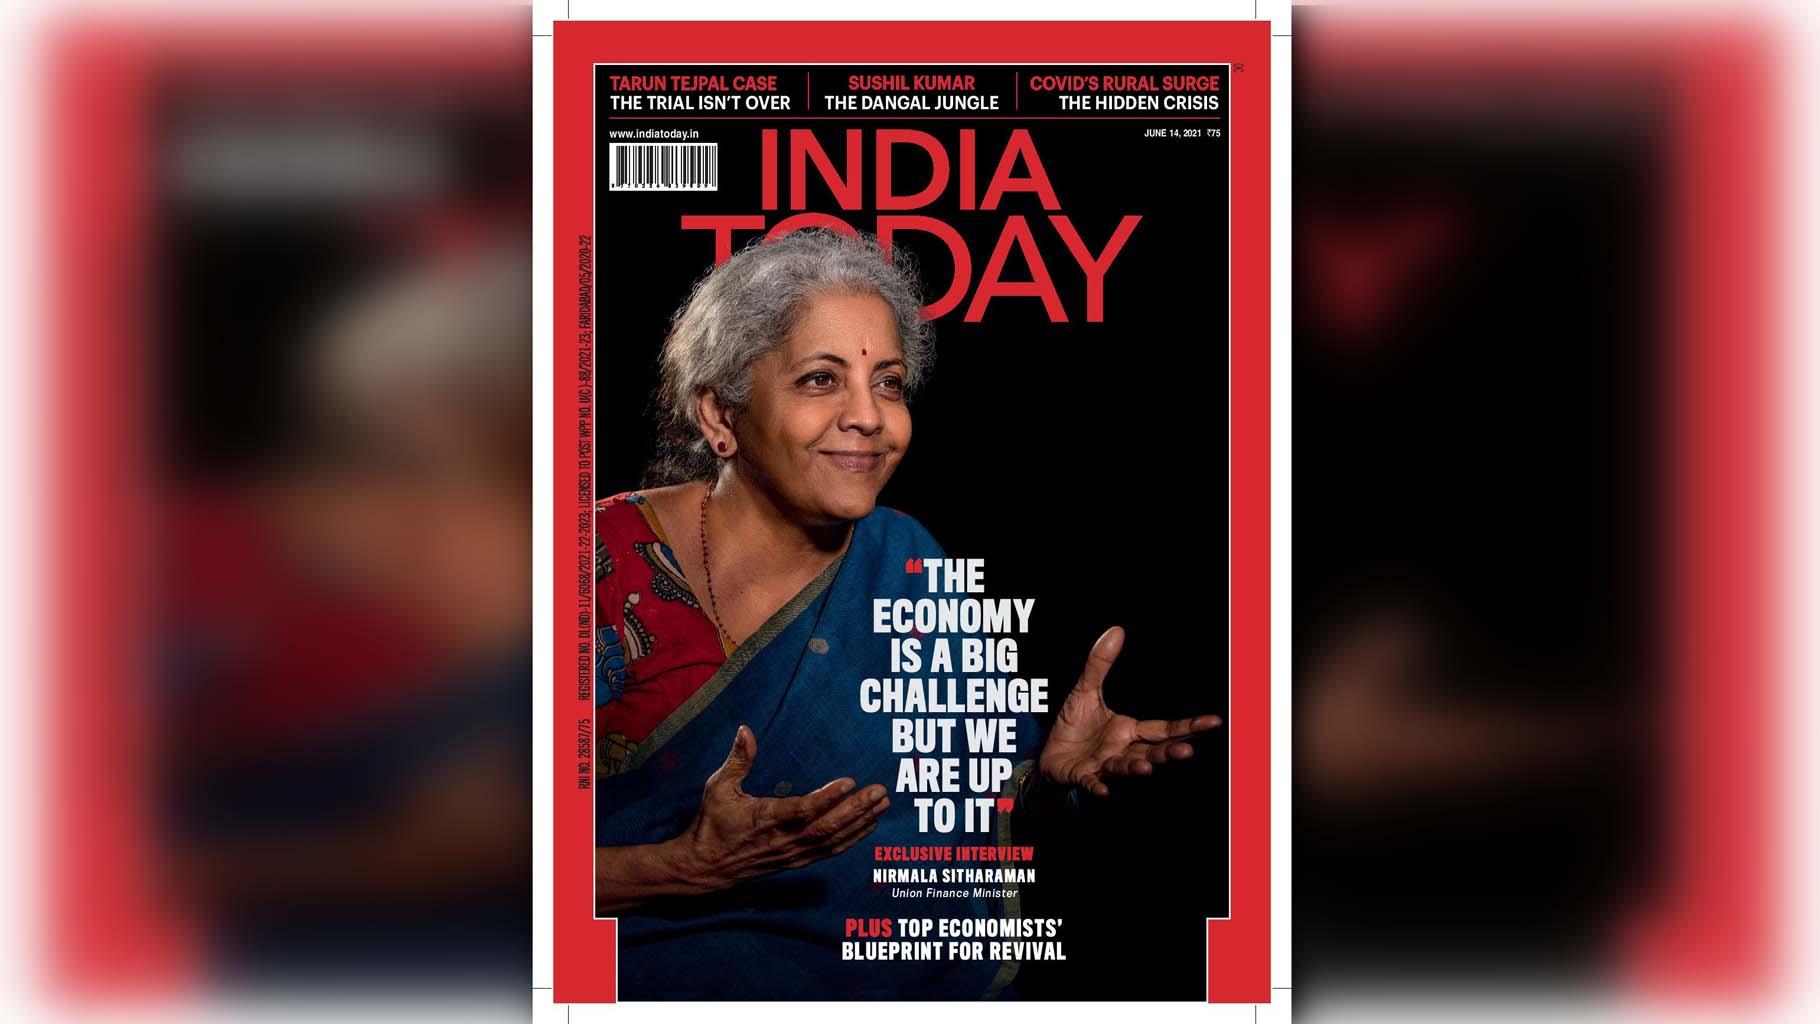 India today magazine, Economic impact of covid-19, Covid-19, Covideconomy